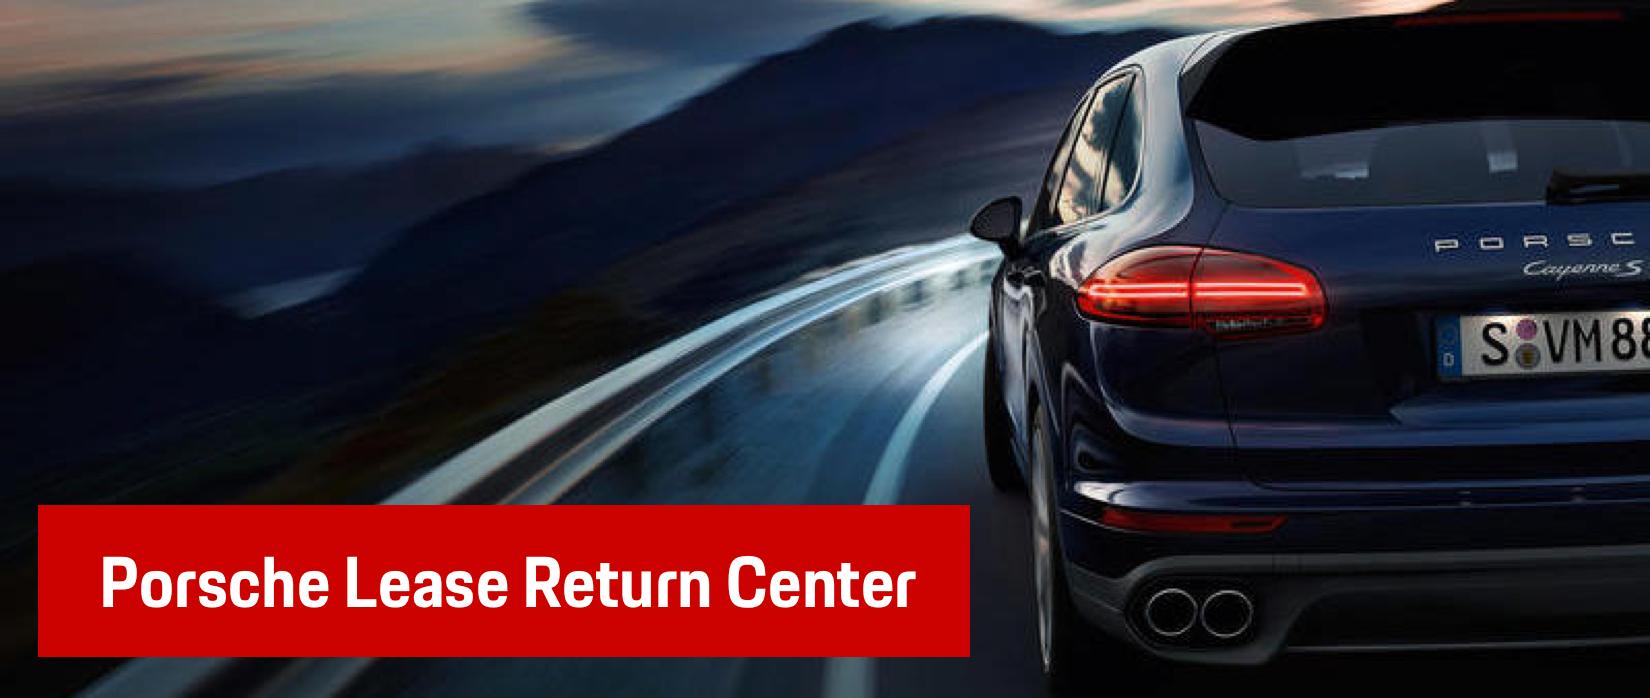 Porsche Lease Return Center